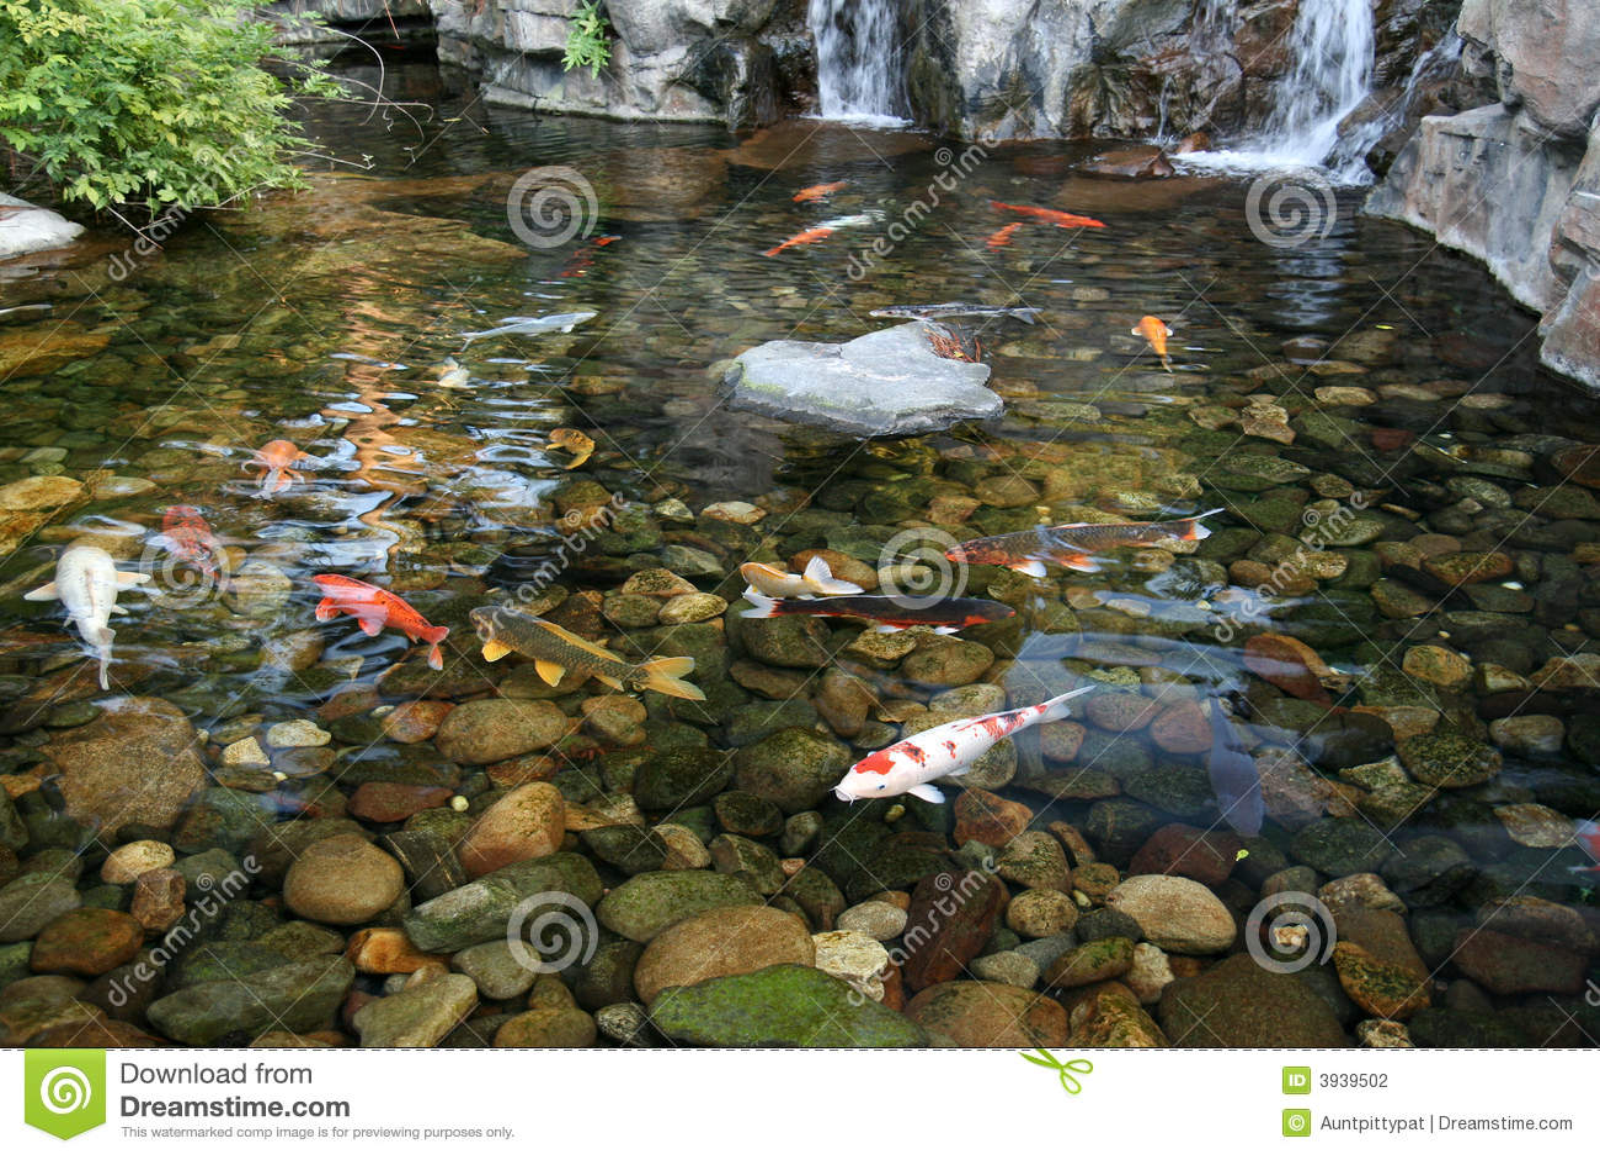 Japanese koi fish pond stock photography image 3939502 for Koi fish pond japan